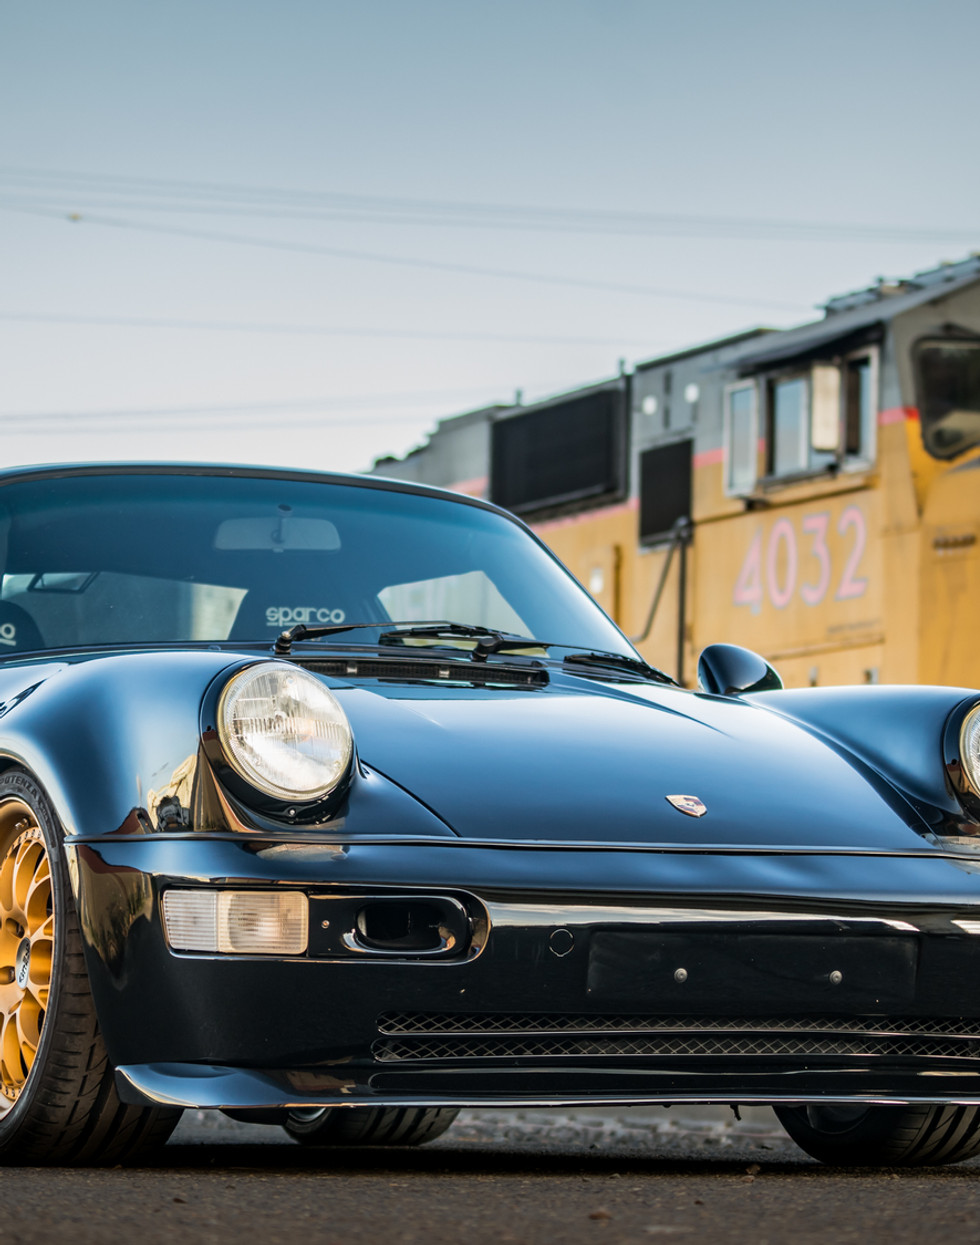 The Image Engine Porsche 964 Turbo